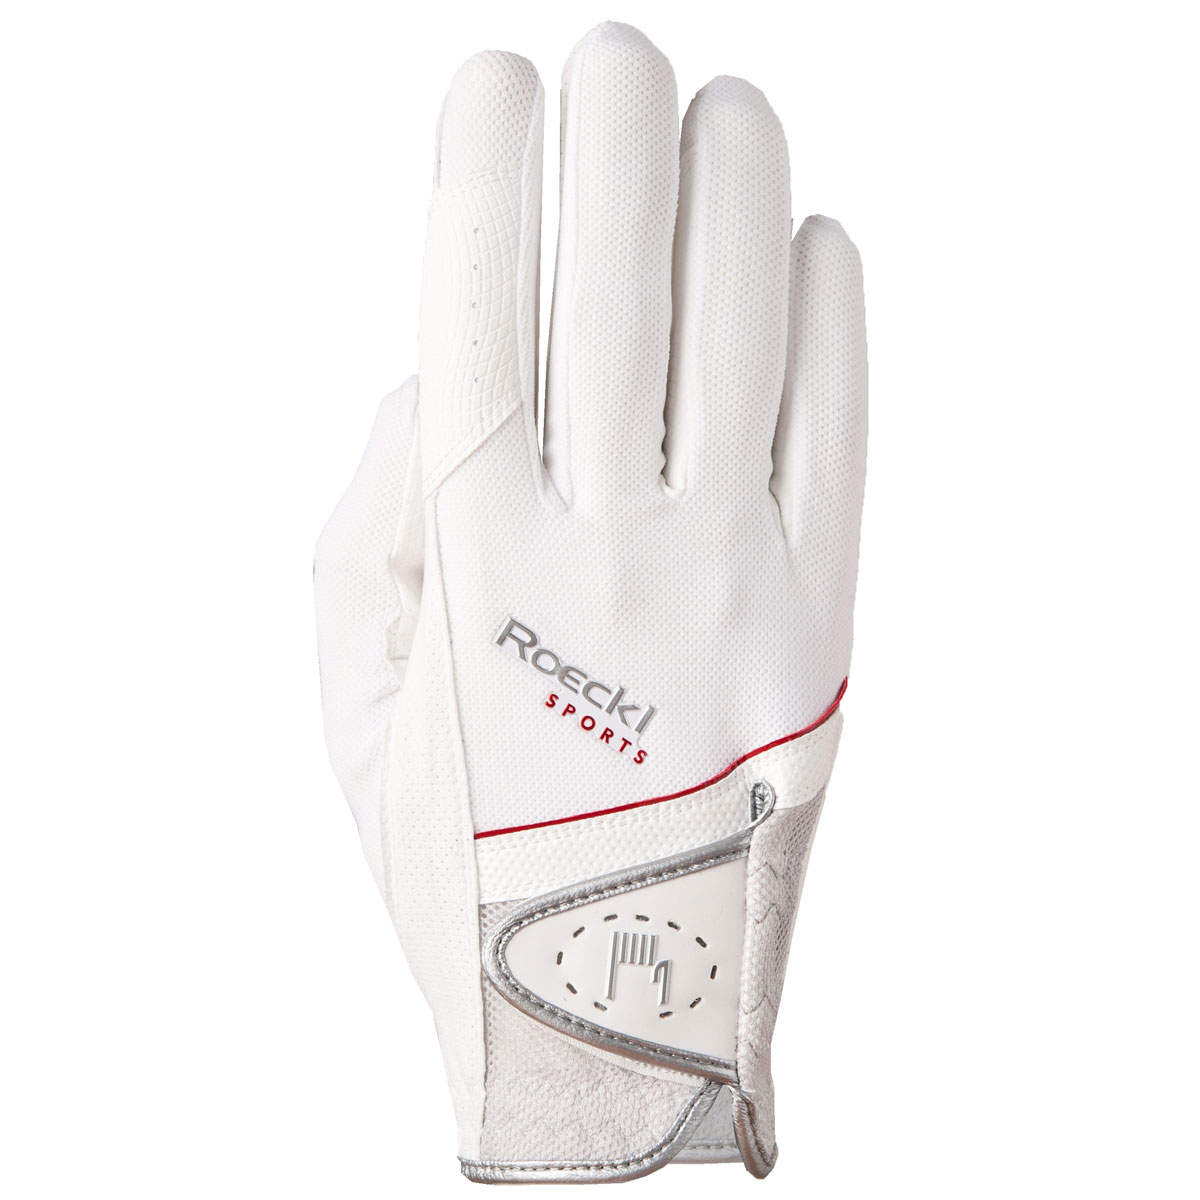 Roeckl London Glove